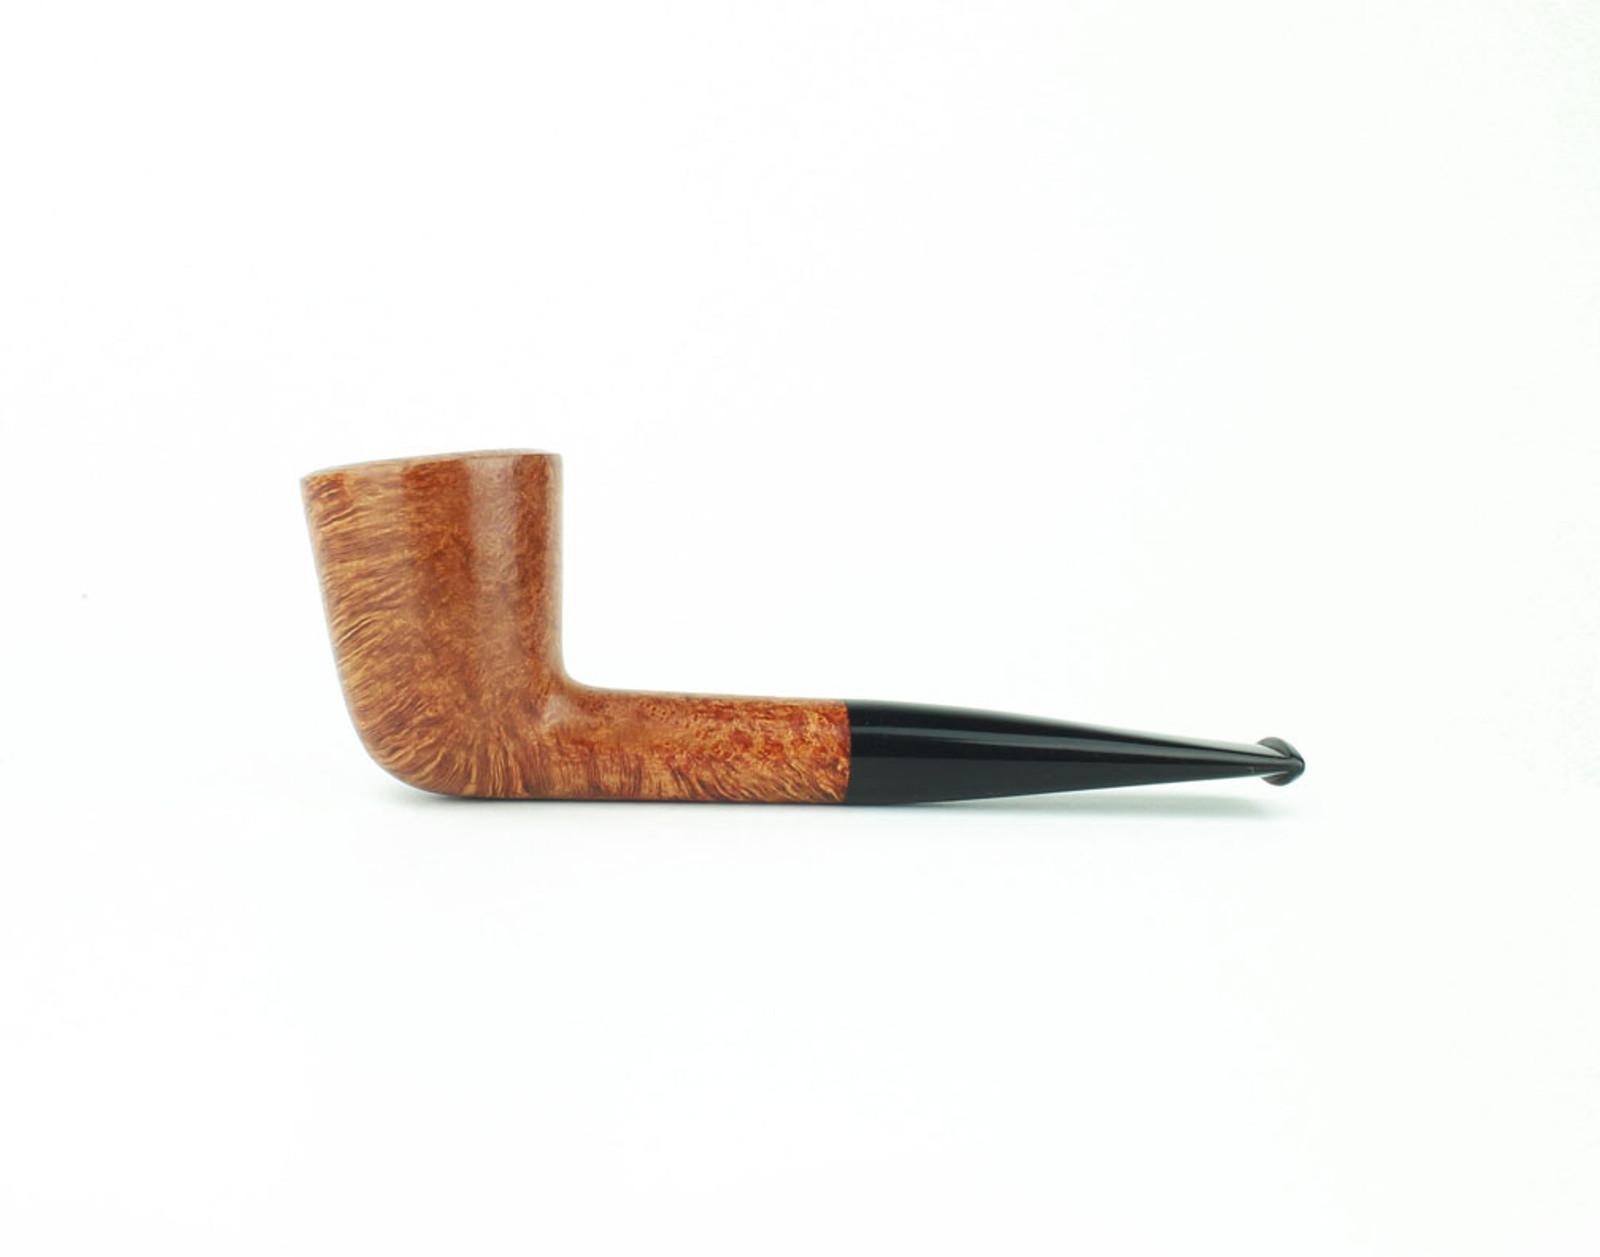 C61LS B - BriarWorks Classic C61 Straight Dublin - Light Smooth w/ Black Stem